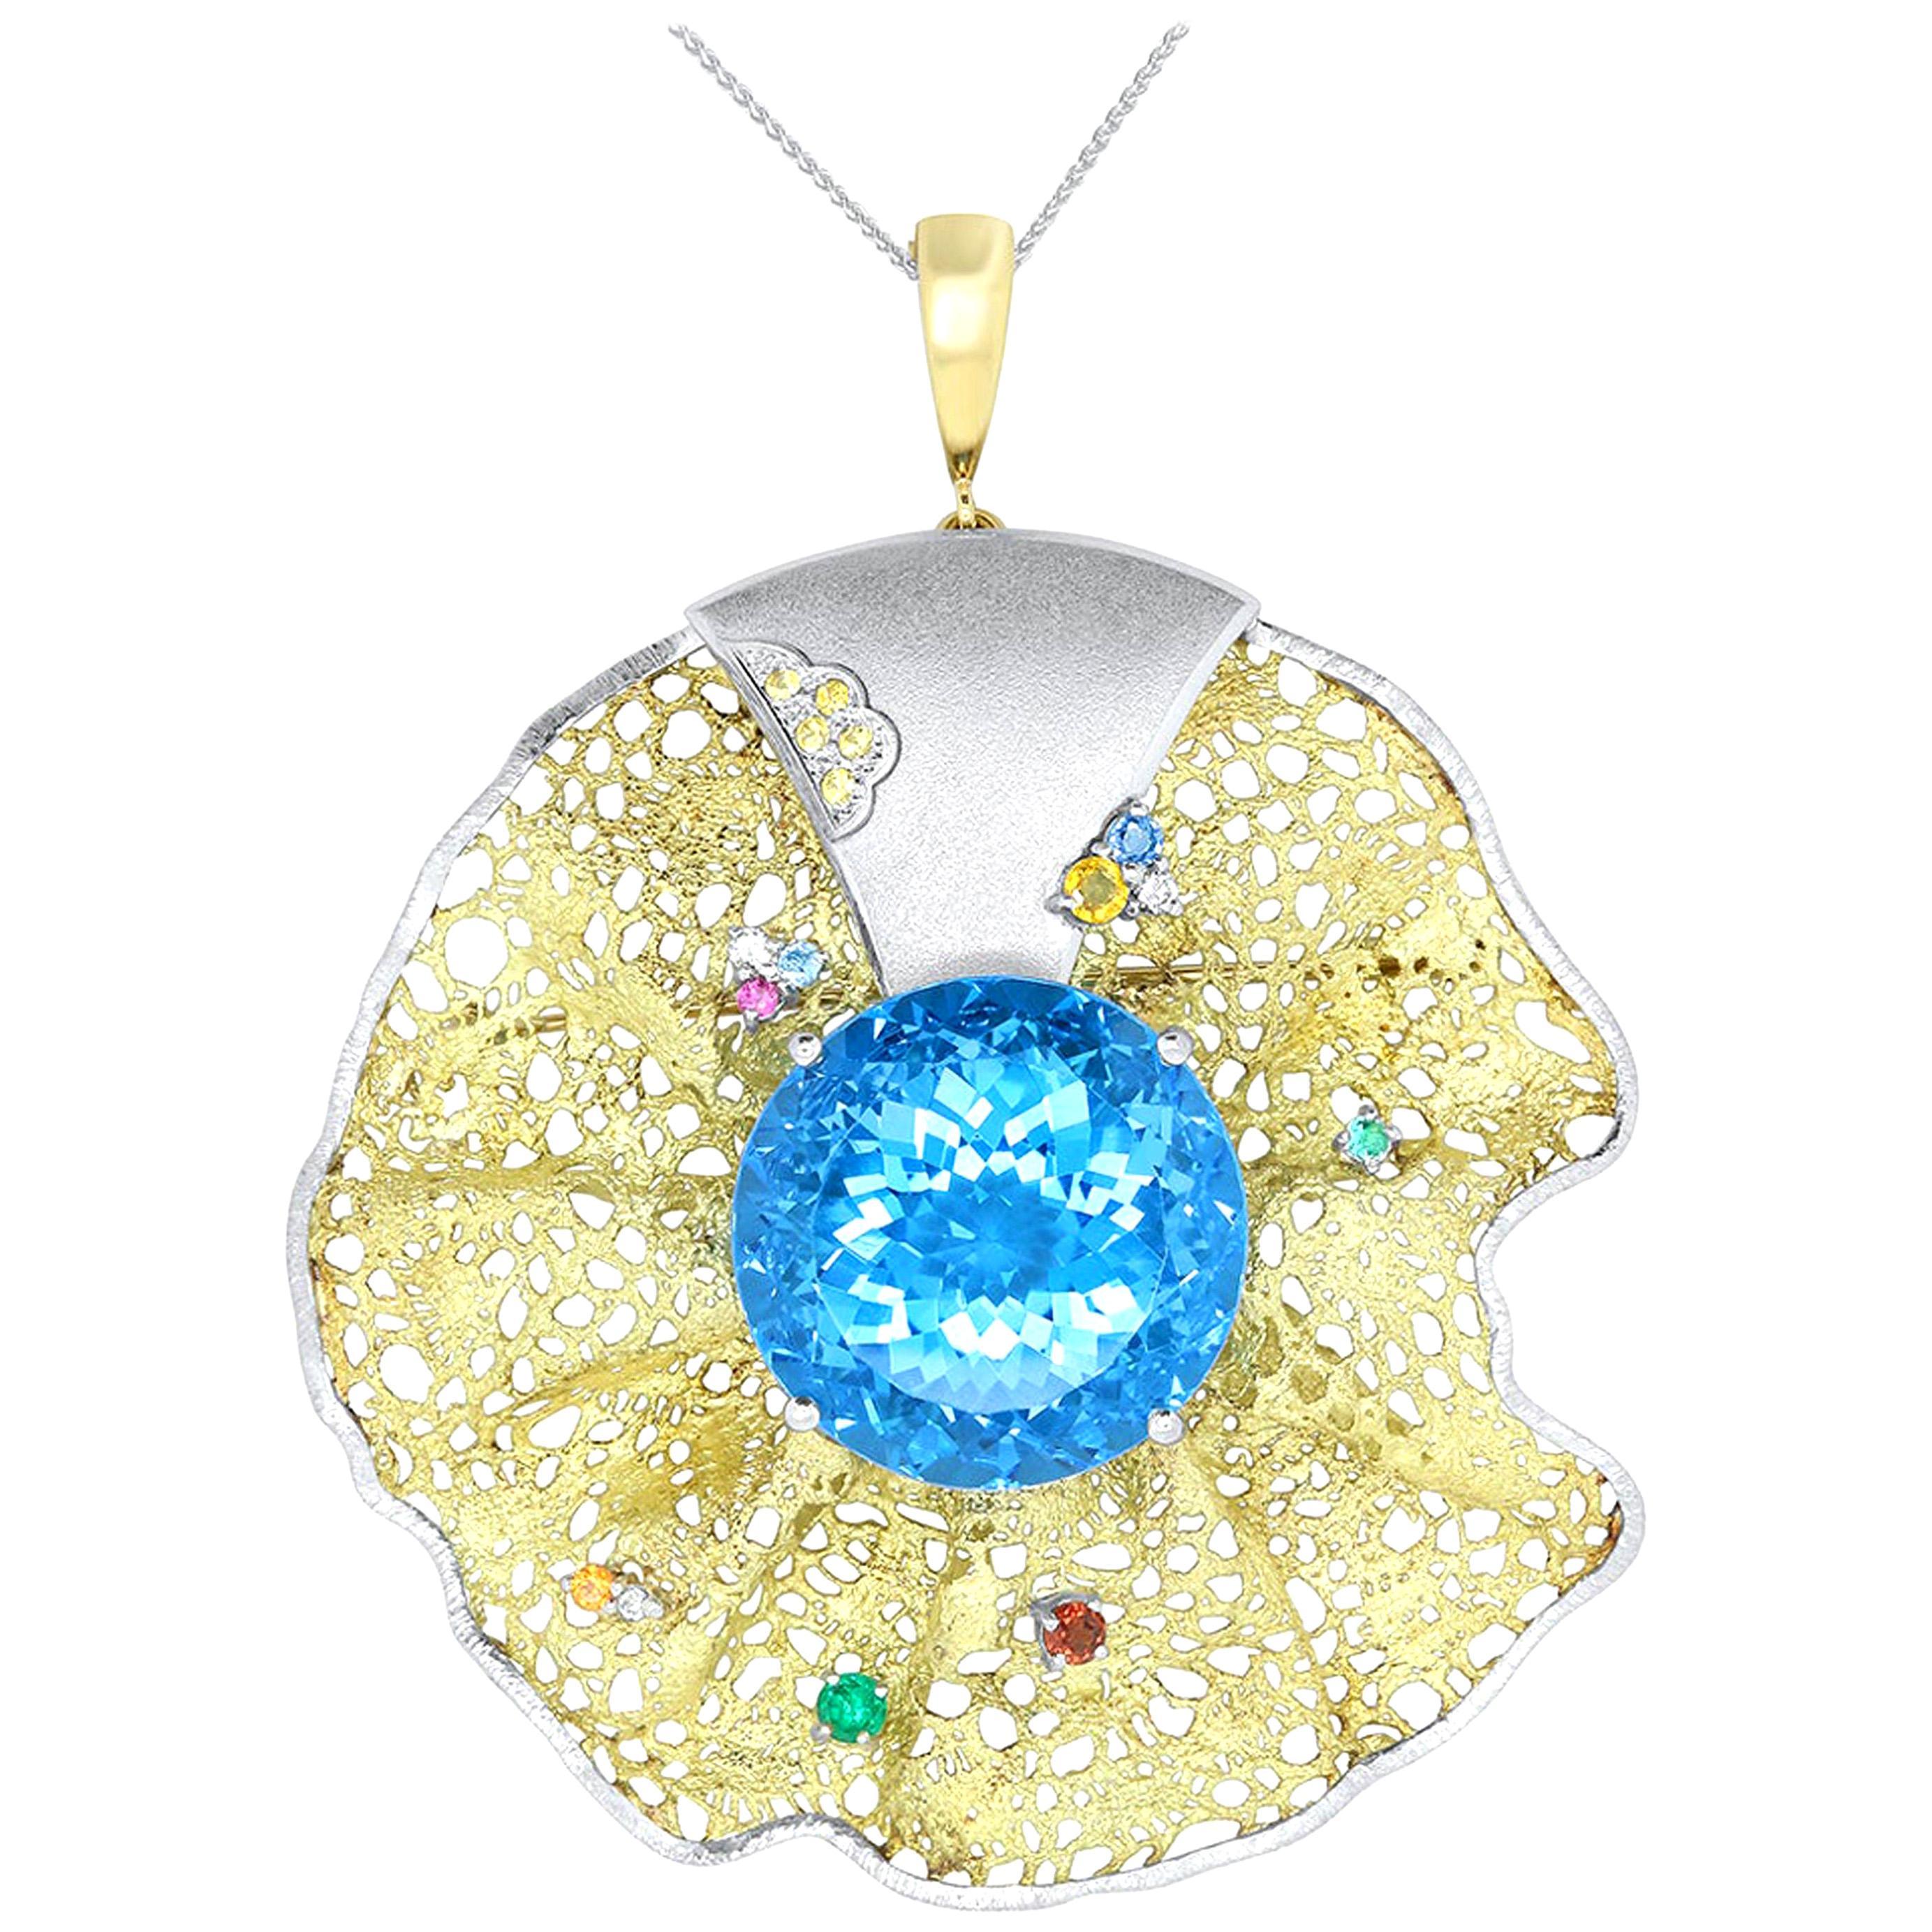 64 Ct Round Blue Topaz Multi-Color Gemstone Diamond Pendant Brooch Pin 18K Gold